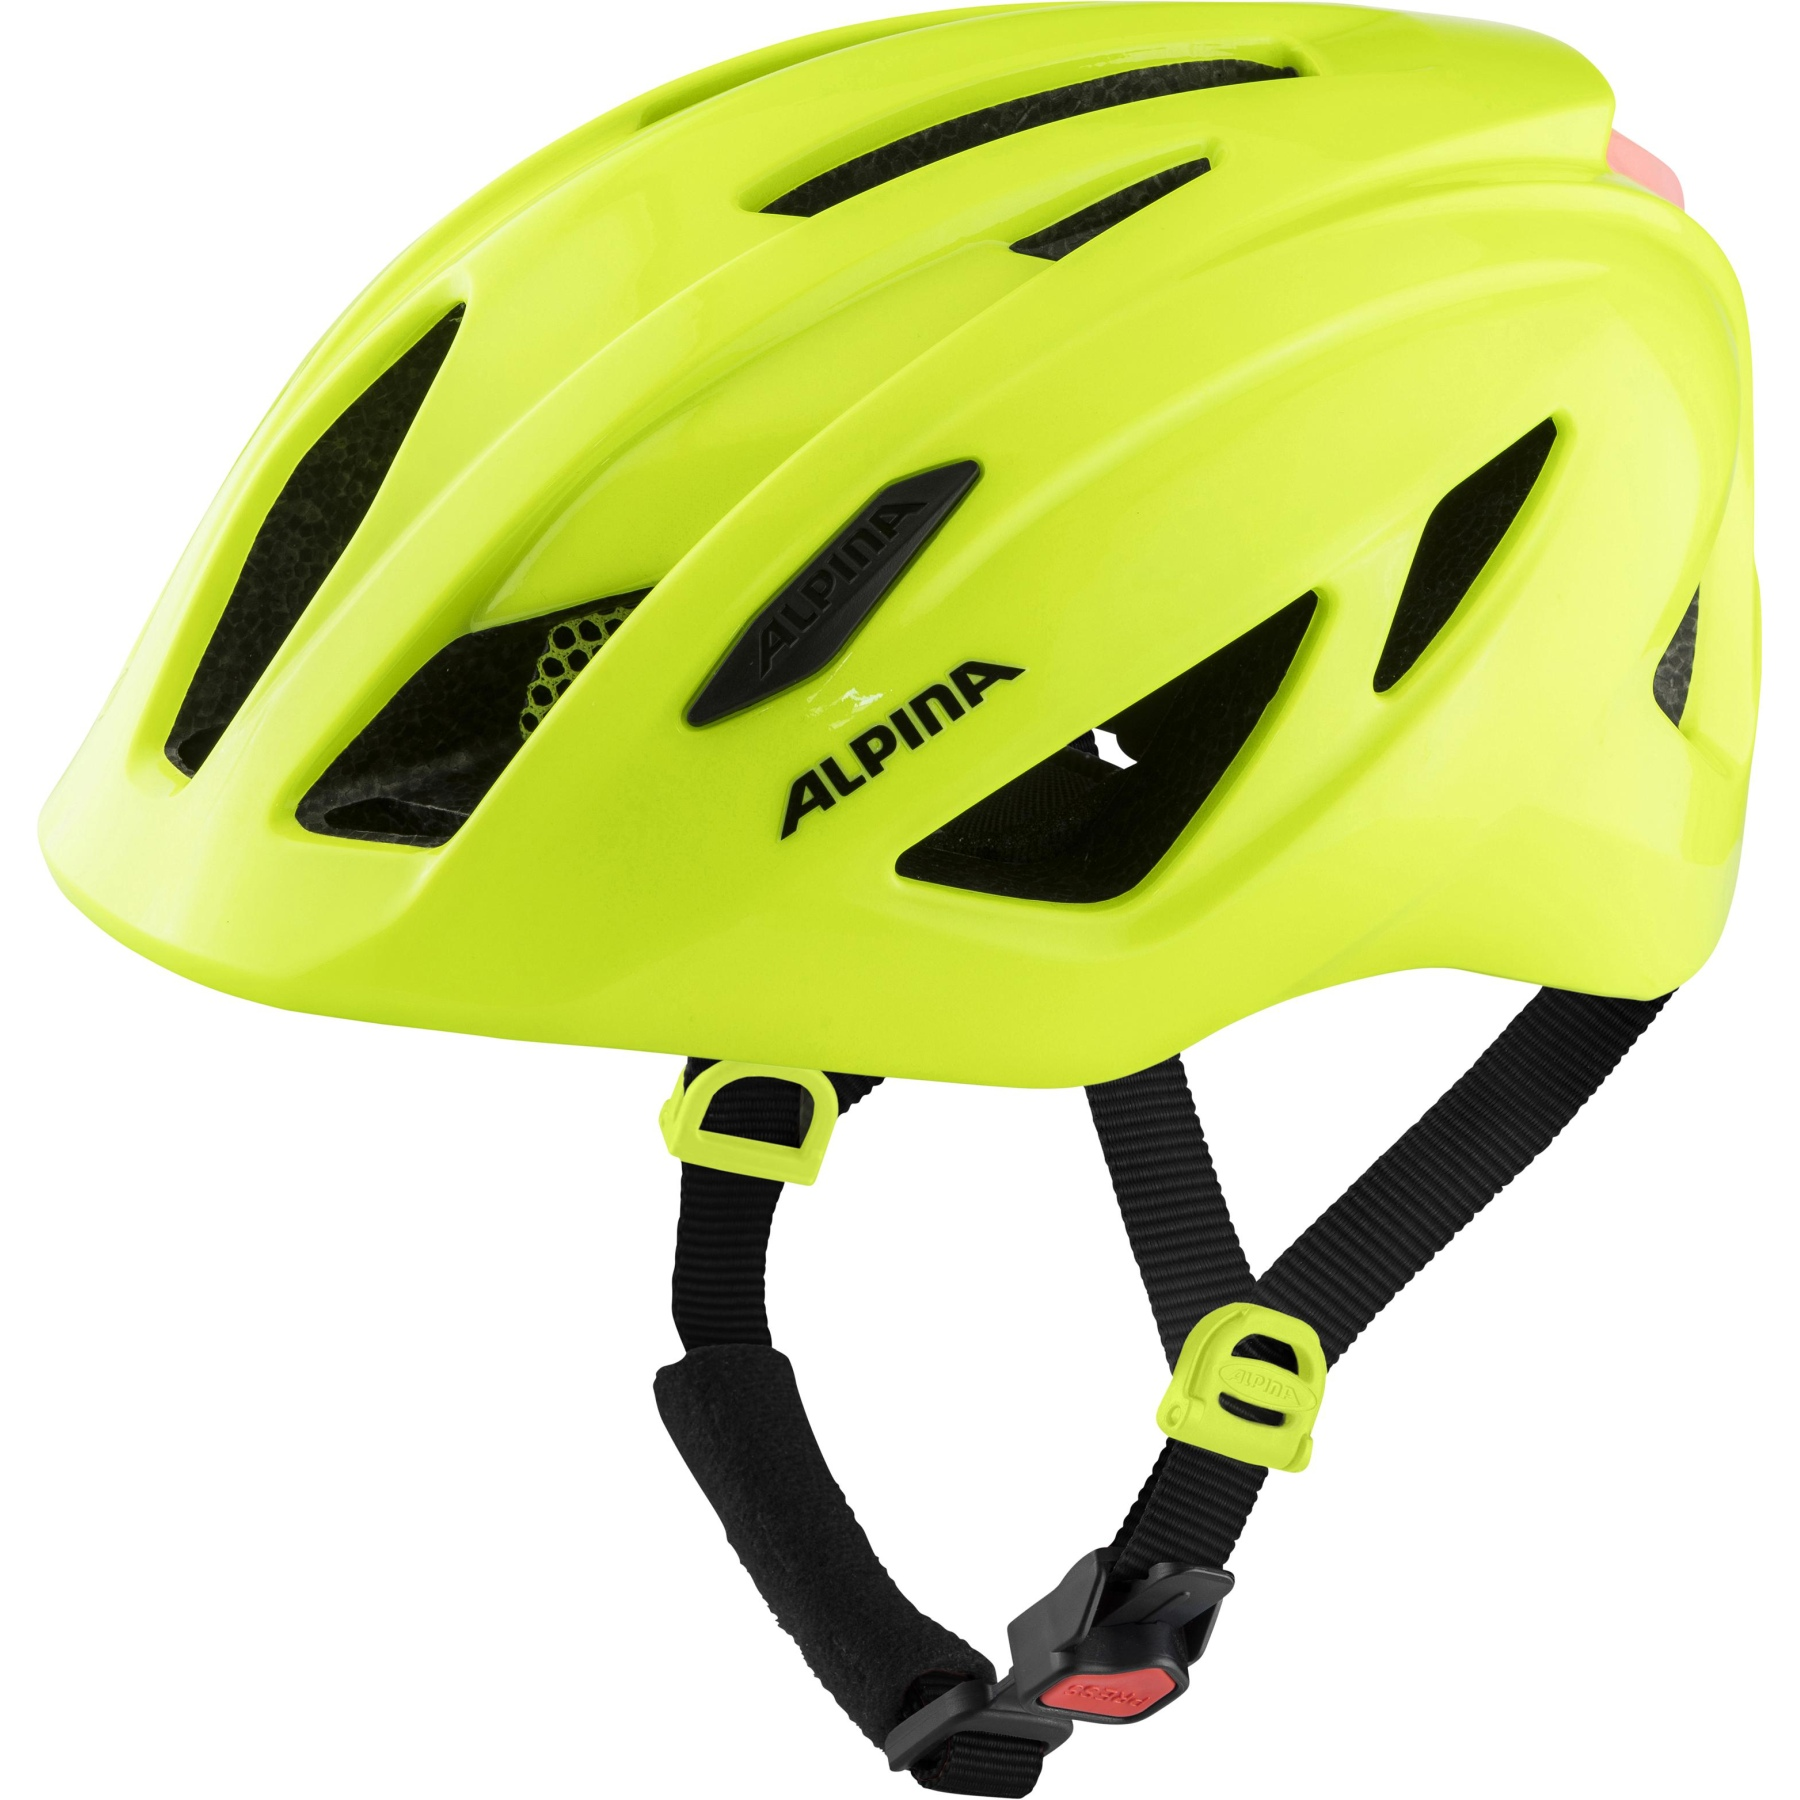 Alpina Pico Flash Kids Helmet - be visible gloss